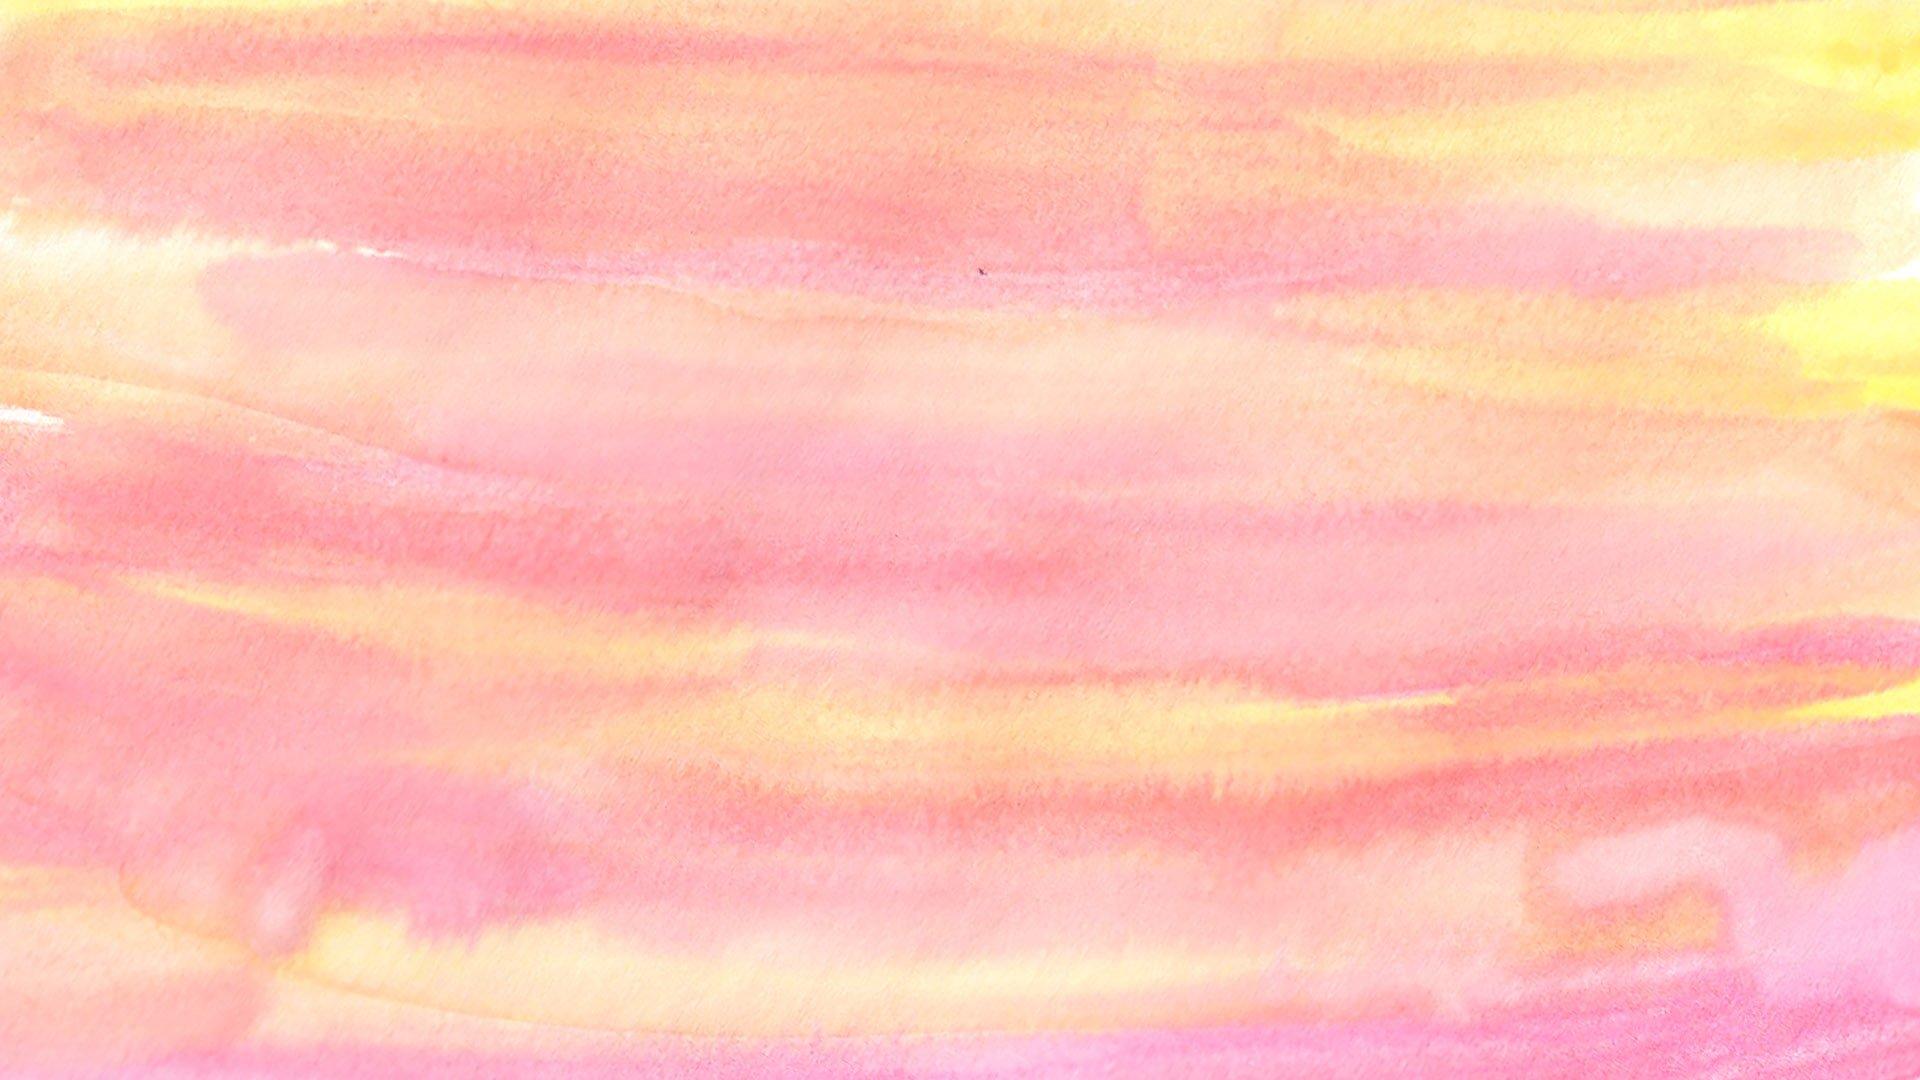 Pastel Aesthetic Wallpaper 1920x1080